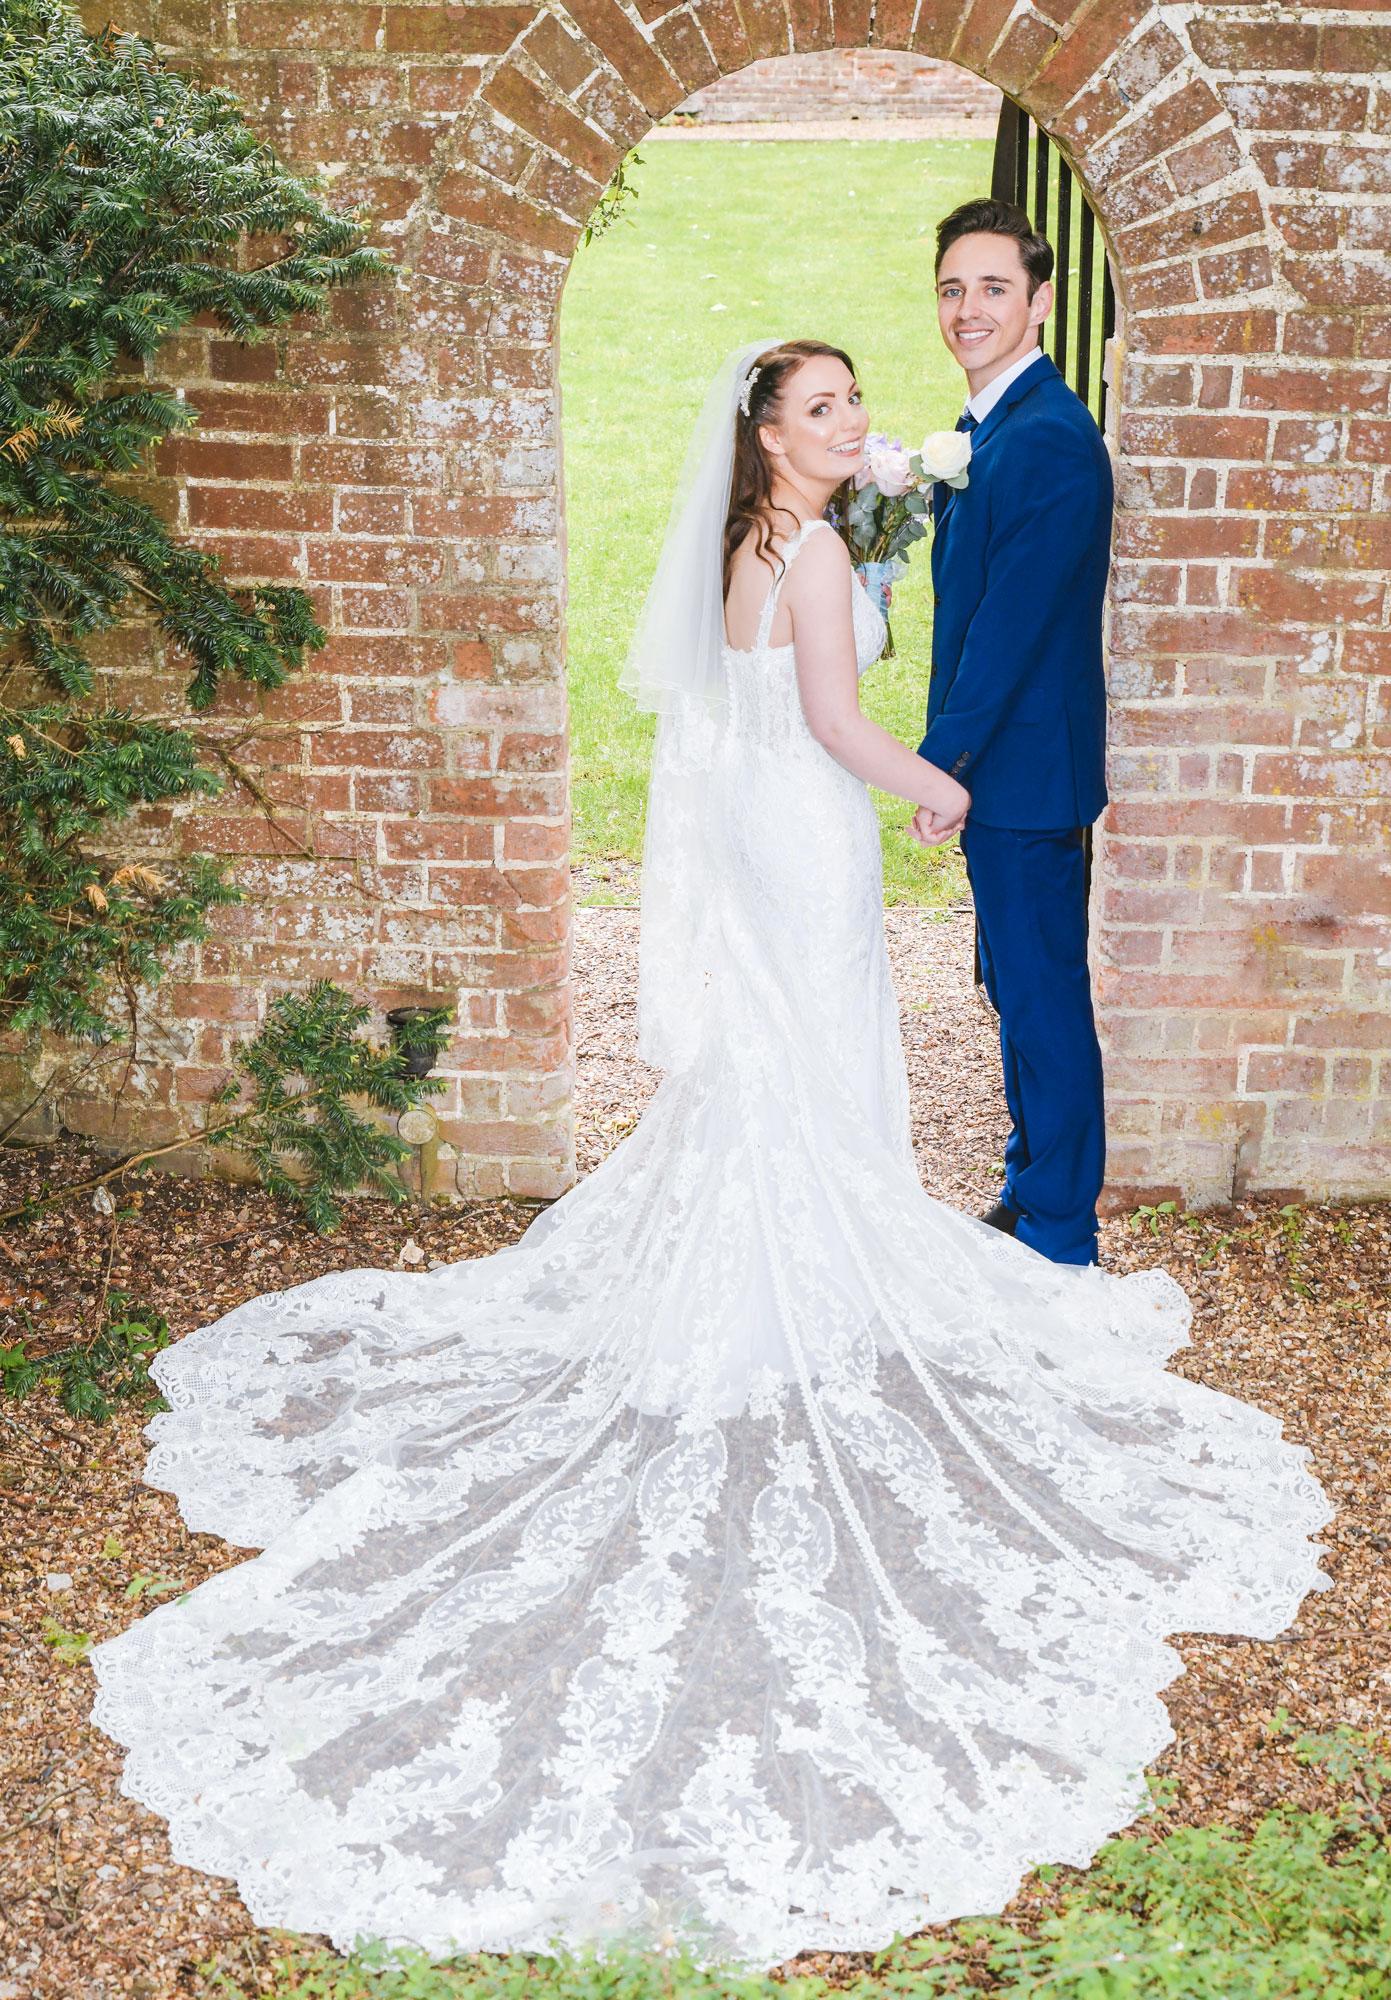 Wotton House Photographer for Wedding